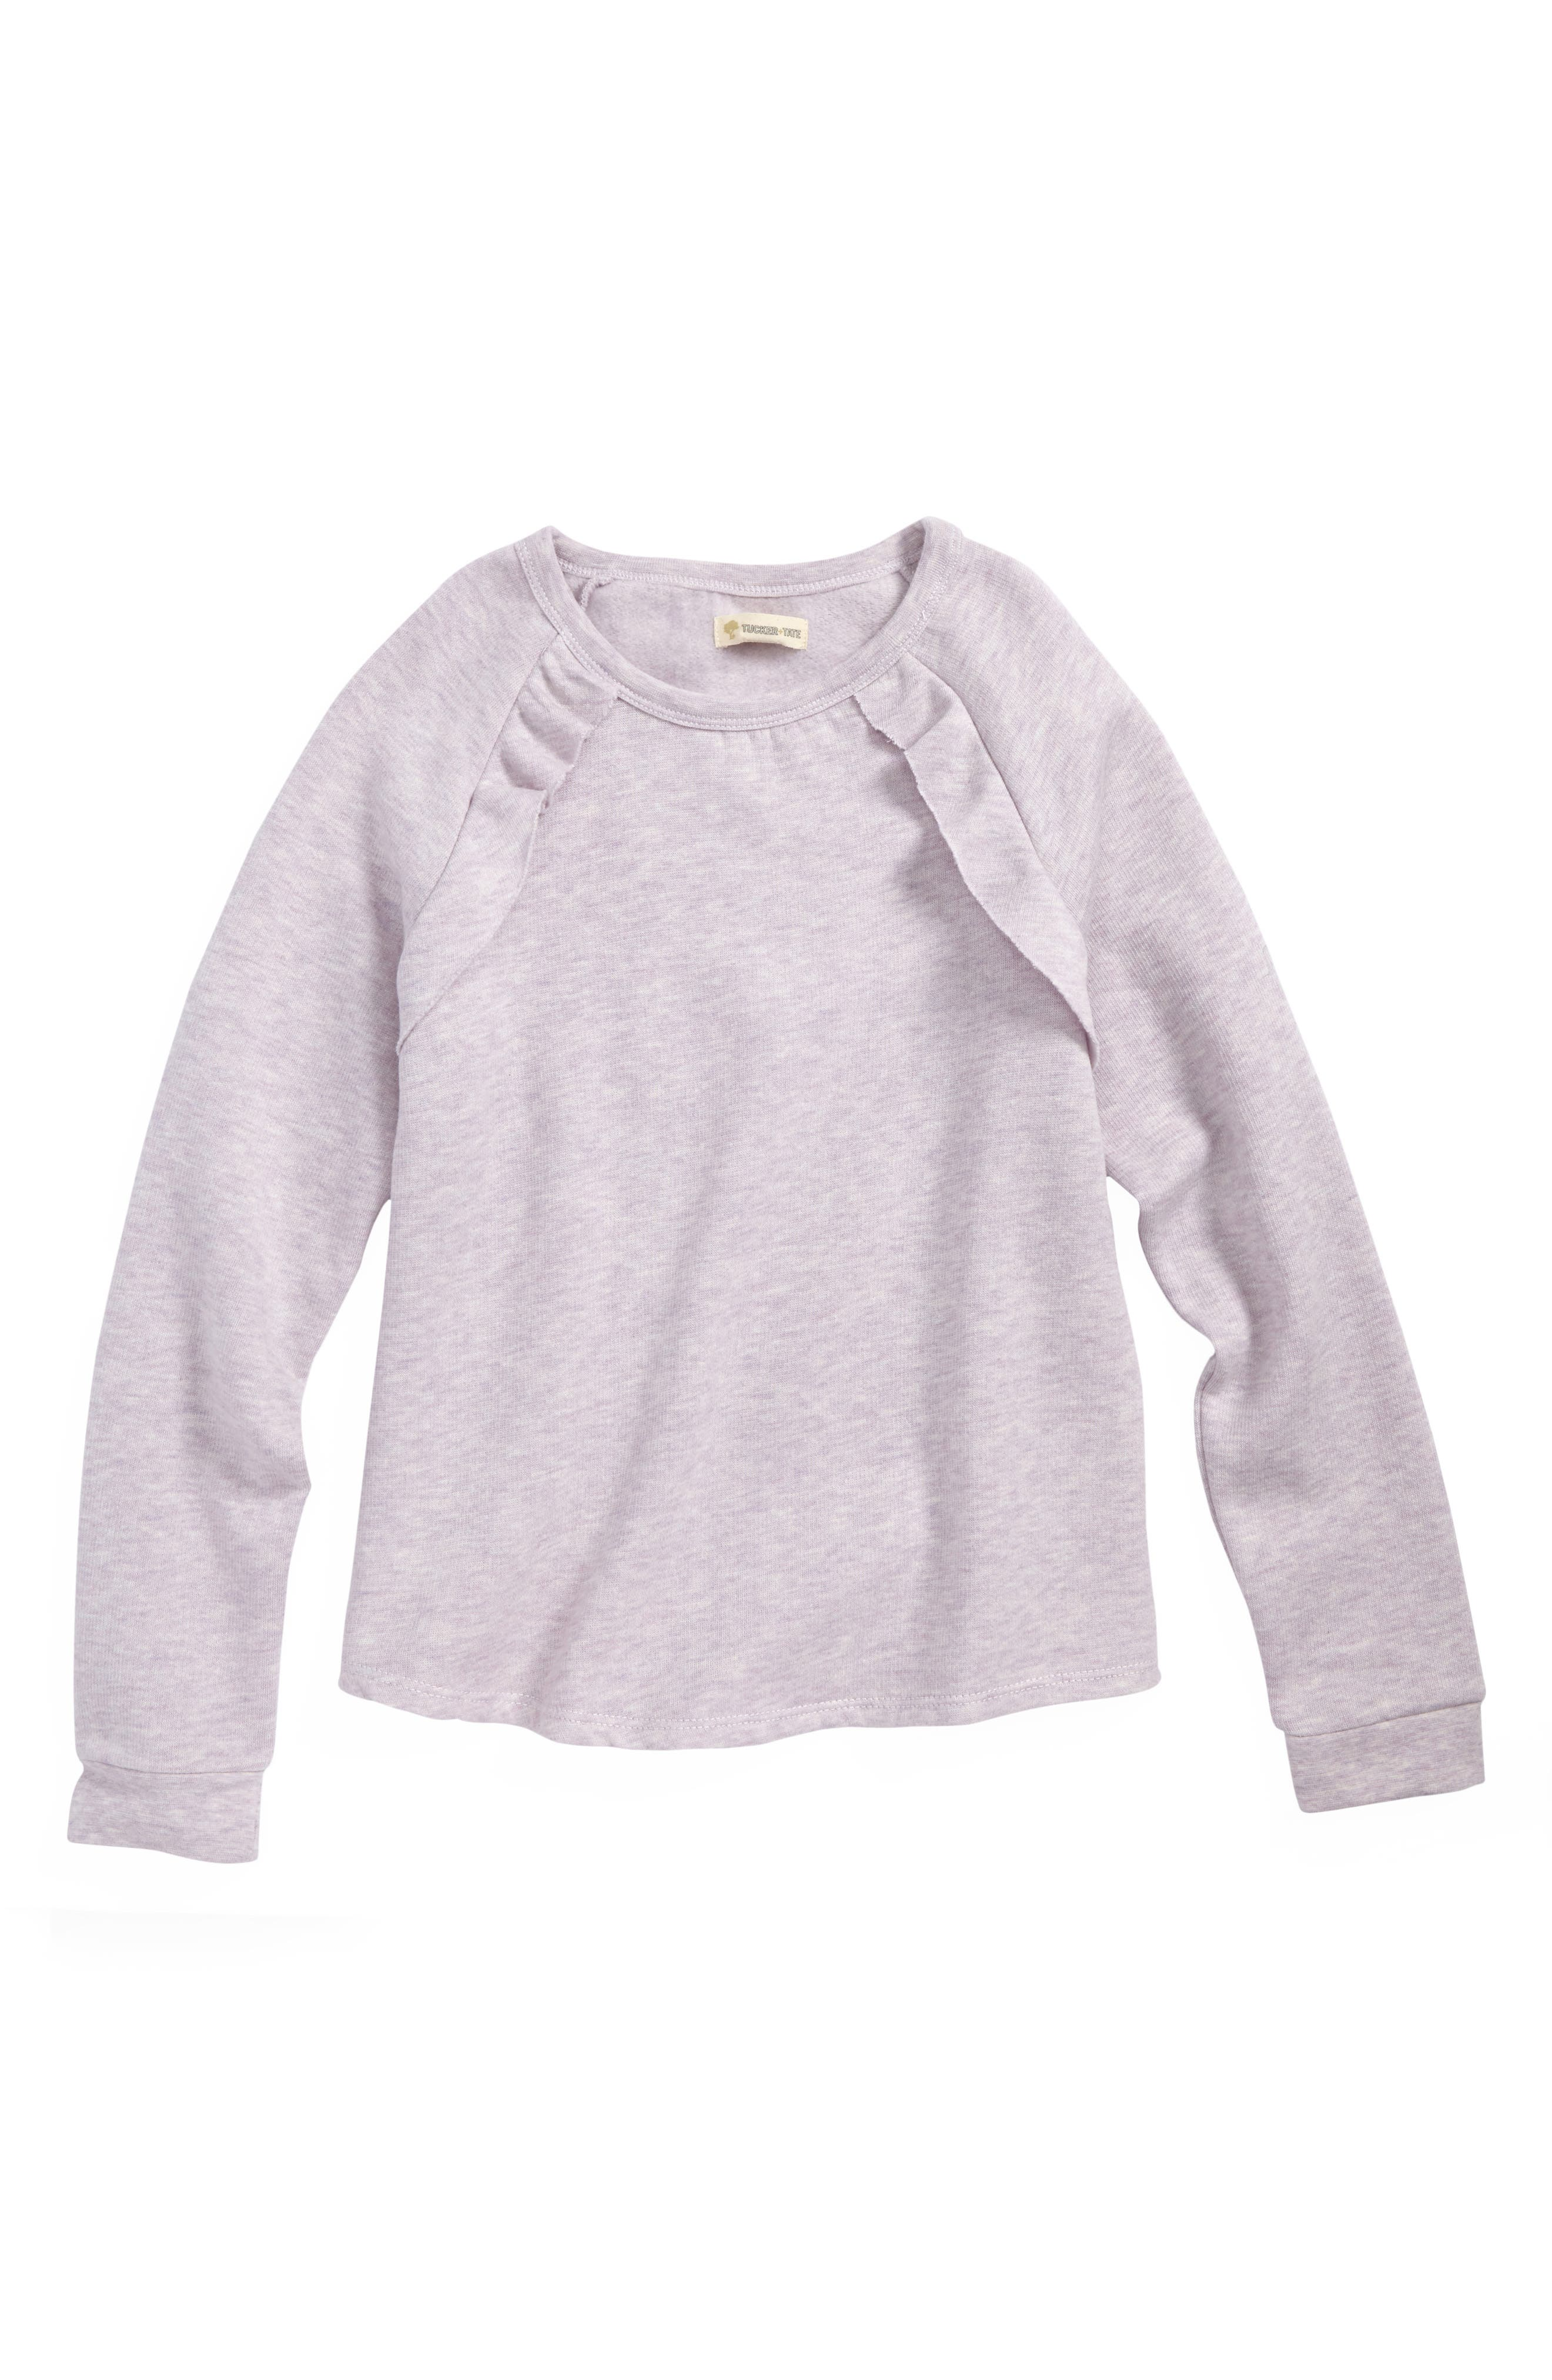 Ruffle Fleece Sweatshirt,                         Main,                         color, PURPLE PETAL HEATHER